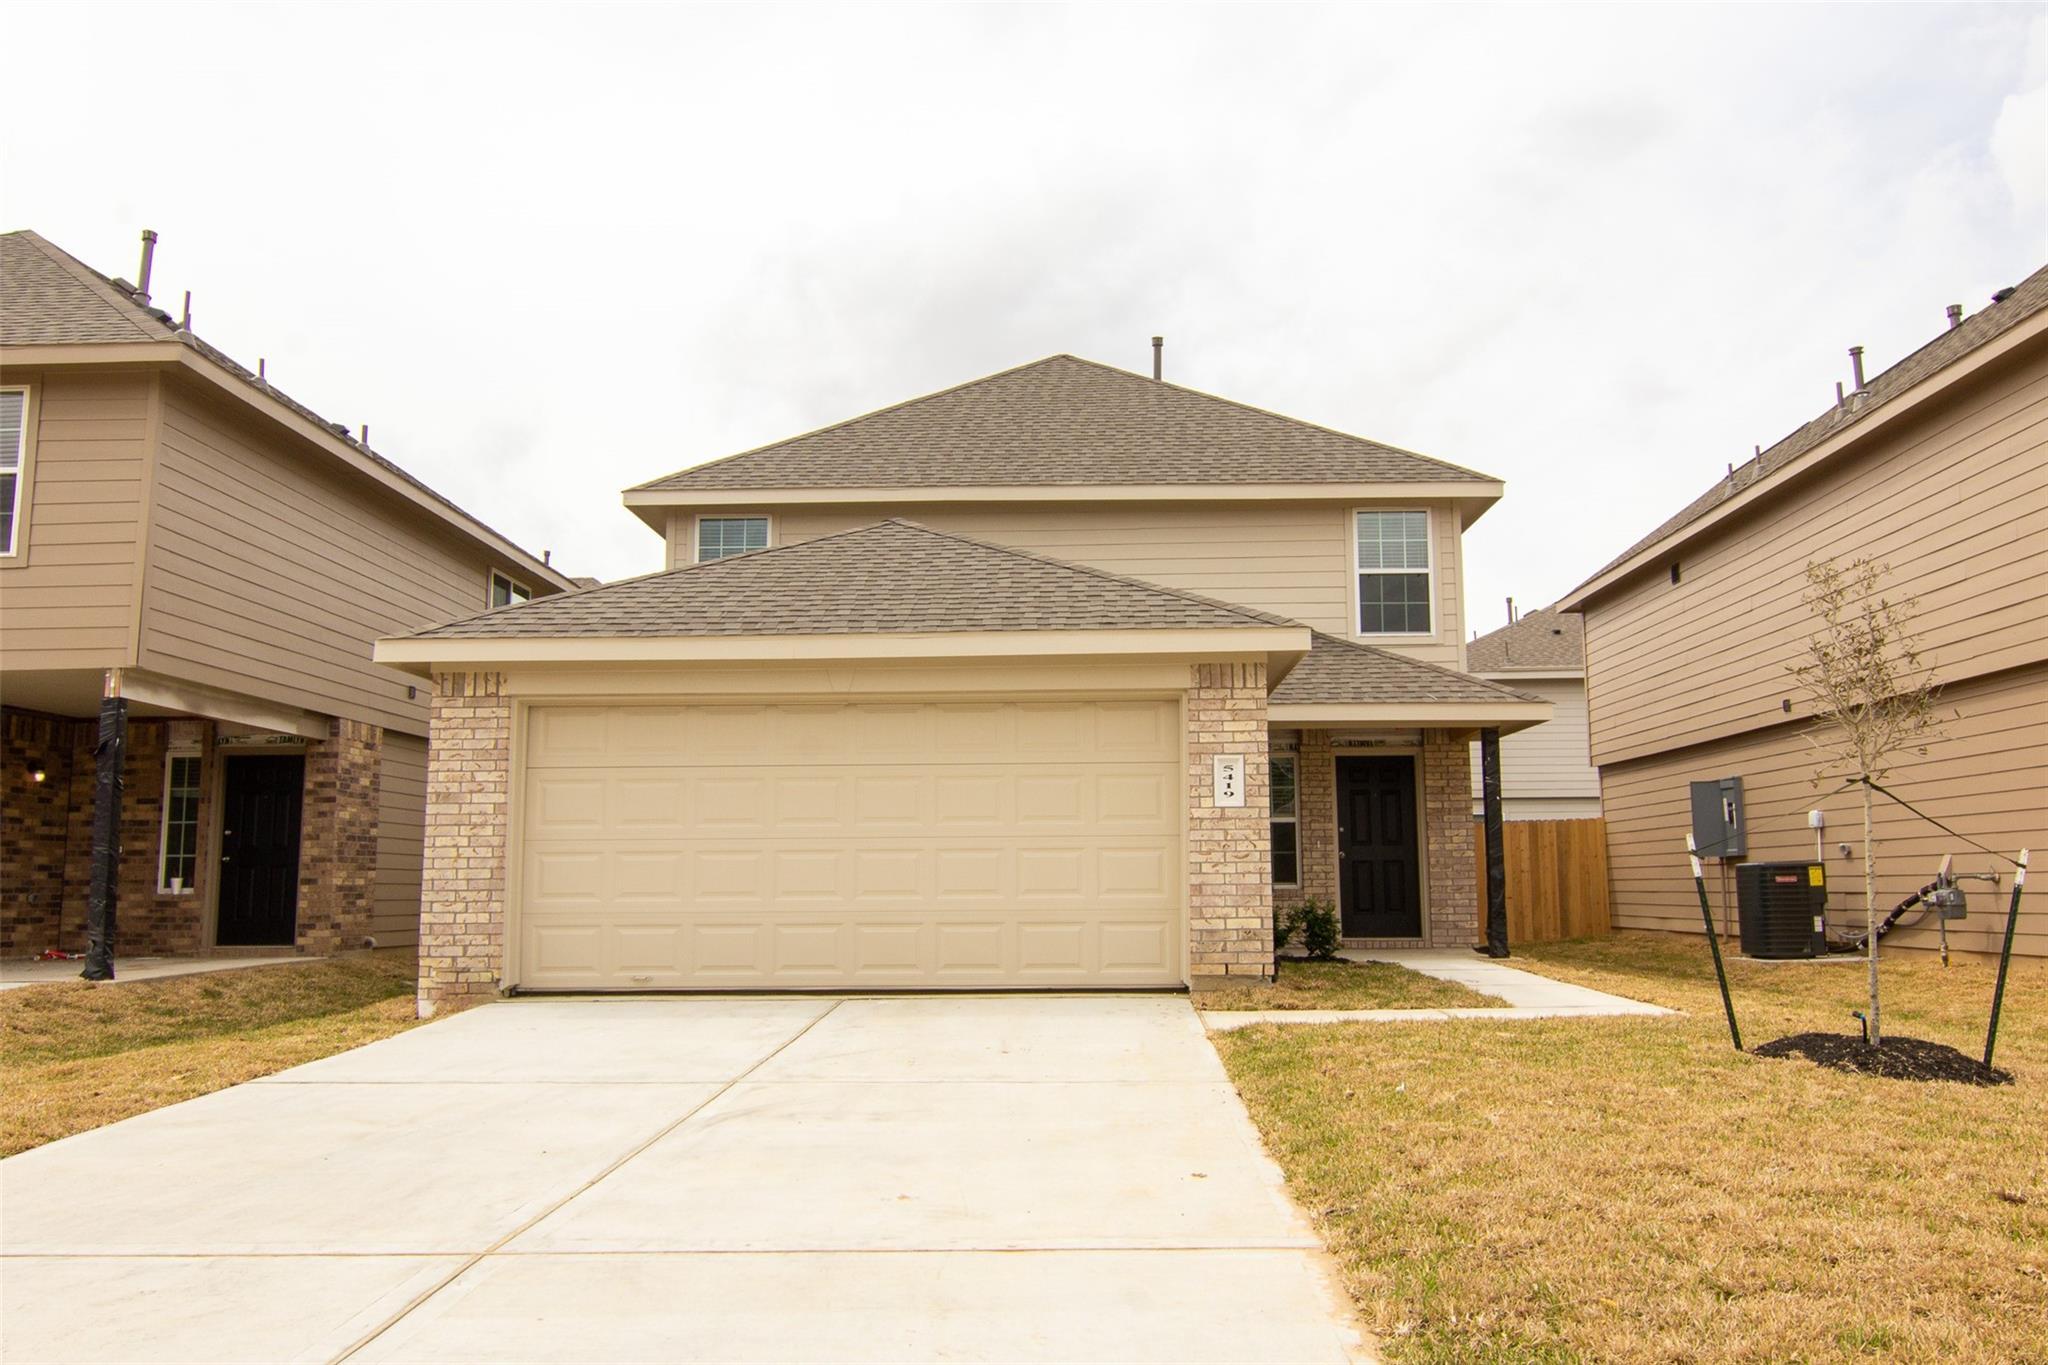 5419 Hawksbury Creek Property Photo - Katy, TX real estate listing